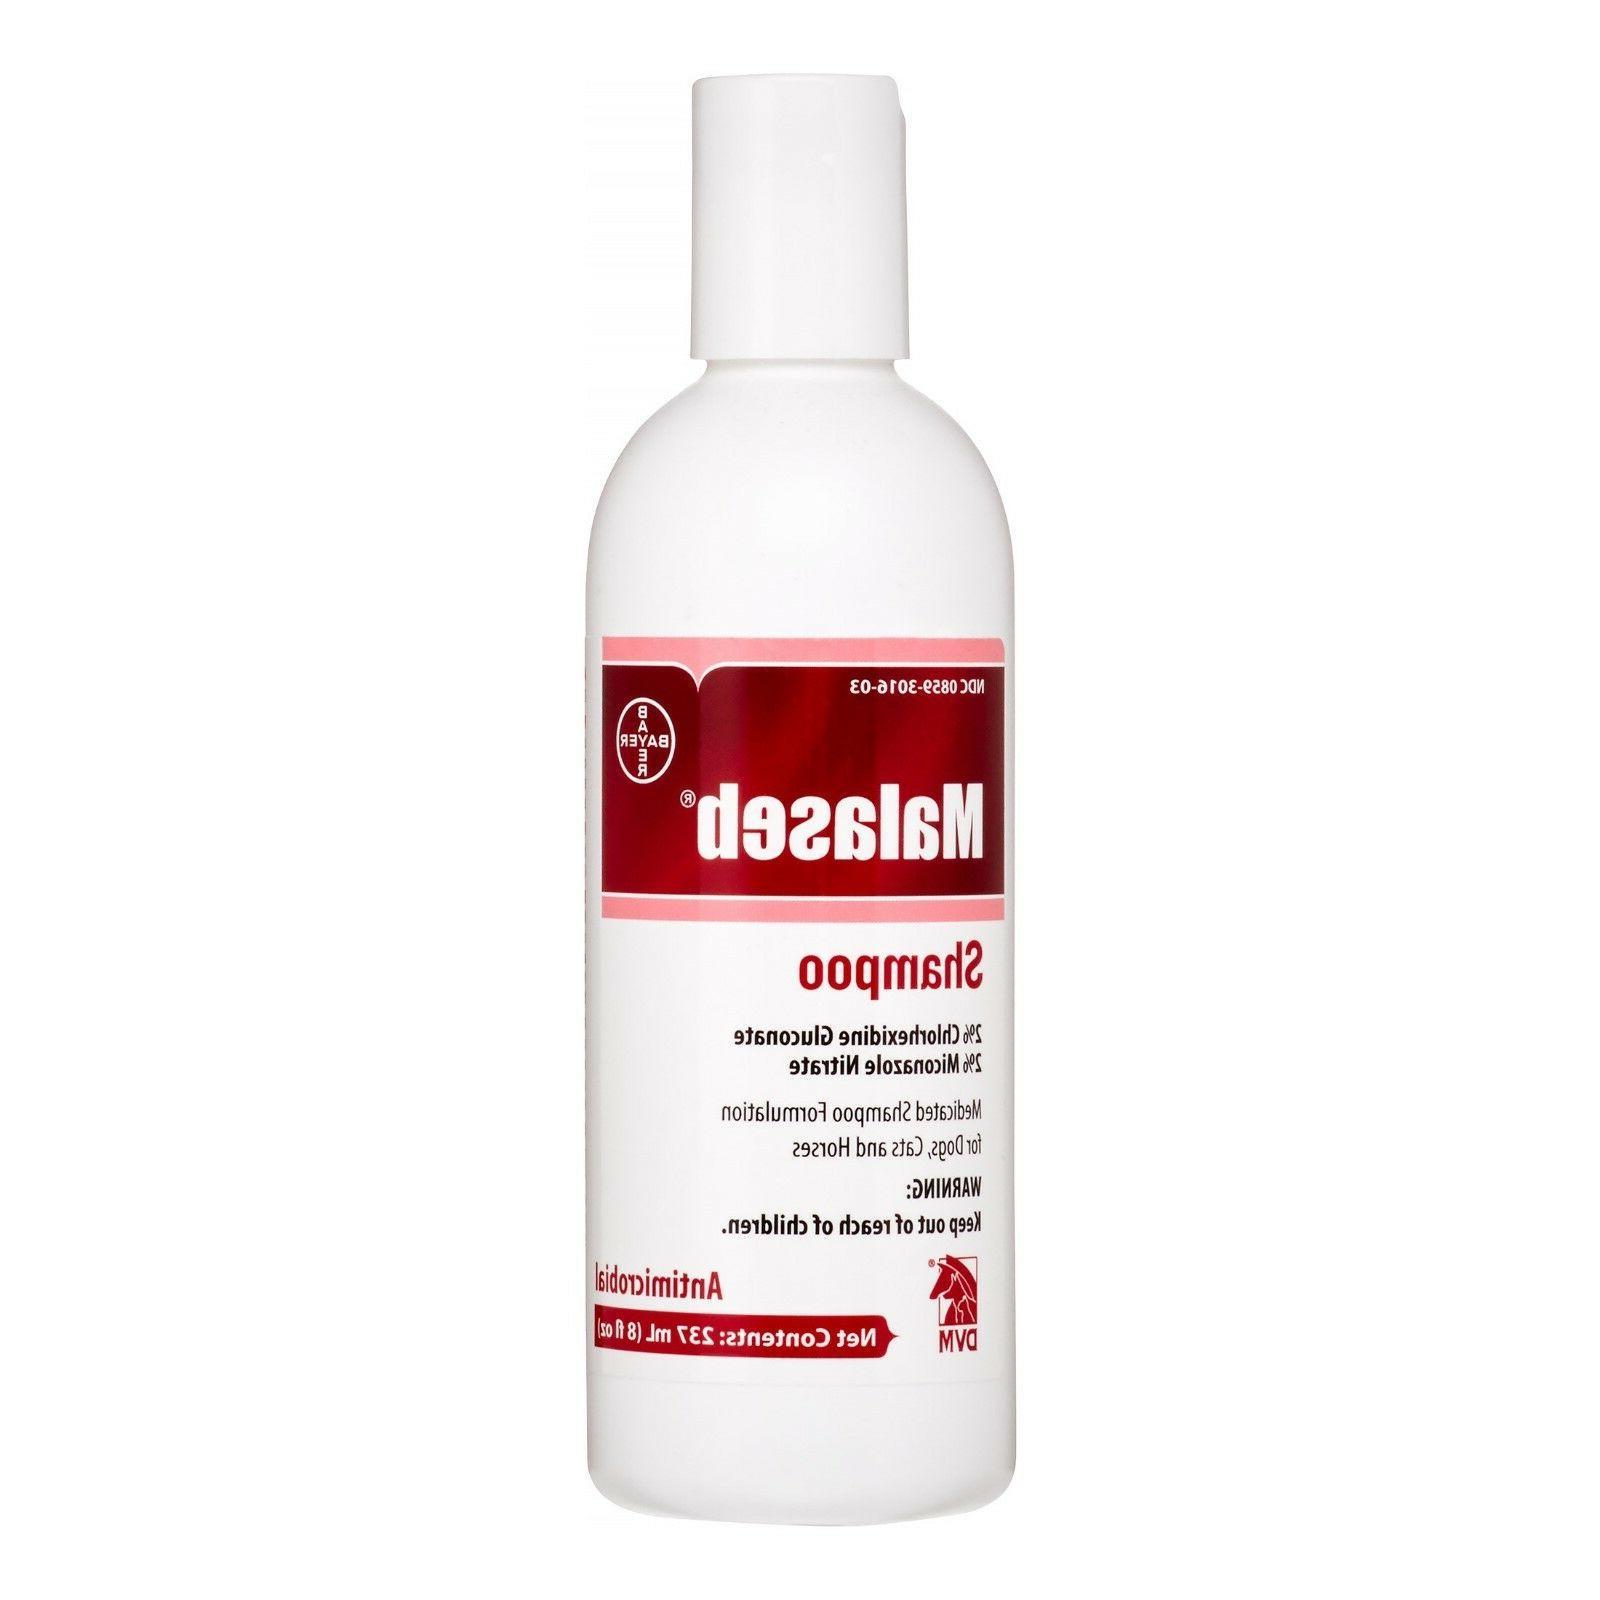 Malaseb Shampoo 237 ml by Teva Animal Health